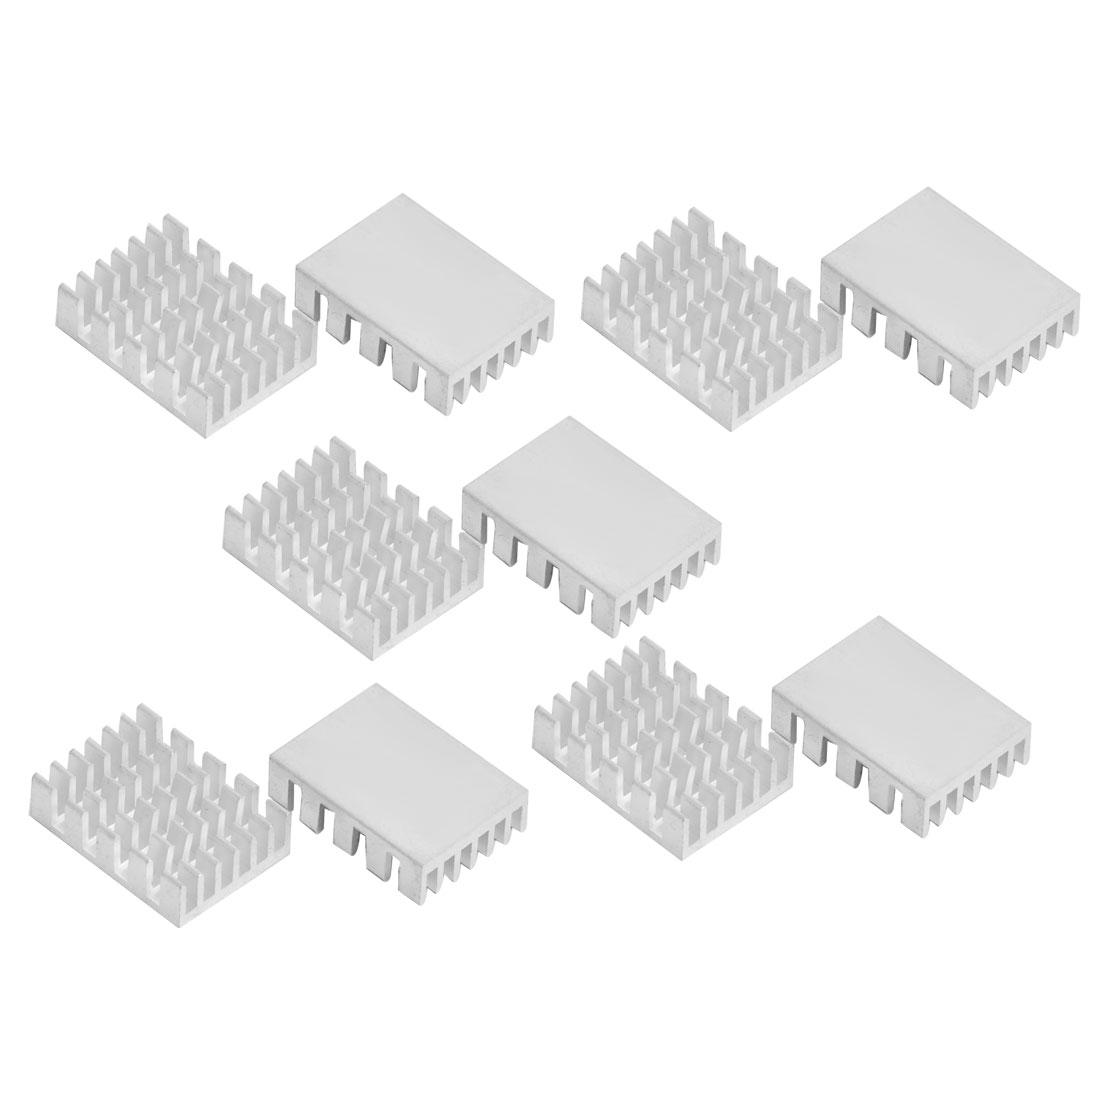 Aluminium Heatsink Cooling Fin Cooler Silver Tone 20mm x 14mm x 6mm 10 Pcs - image 2 of 2